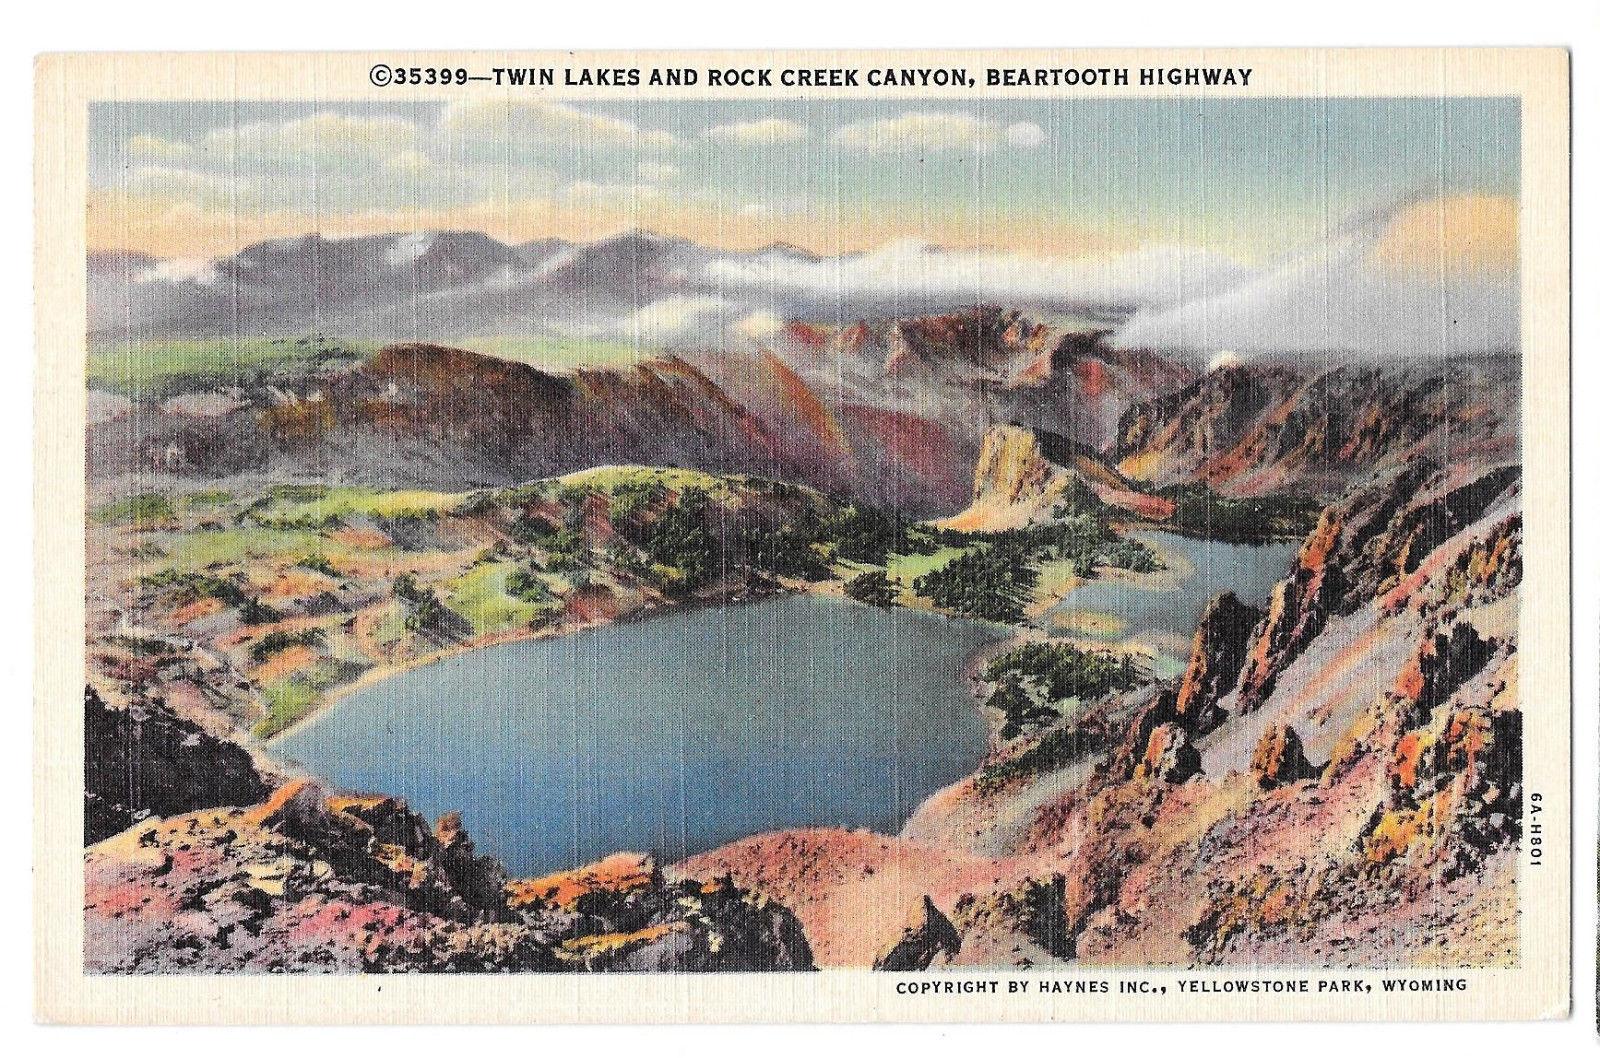 WY Yellowstone Park Twin Lakes Rock Creek Canyon Beartooth Highway Vtg Postcard